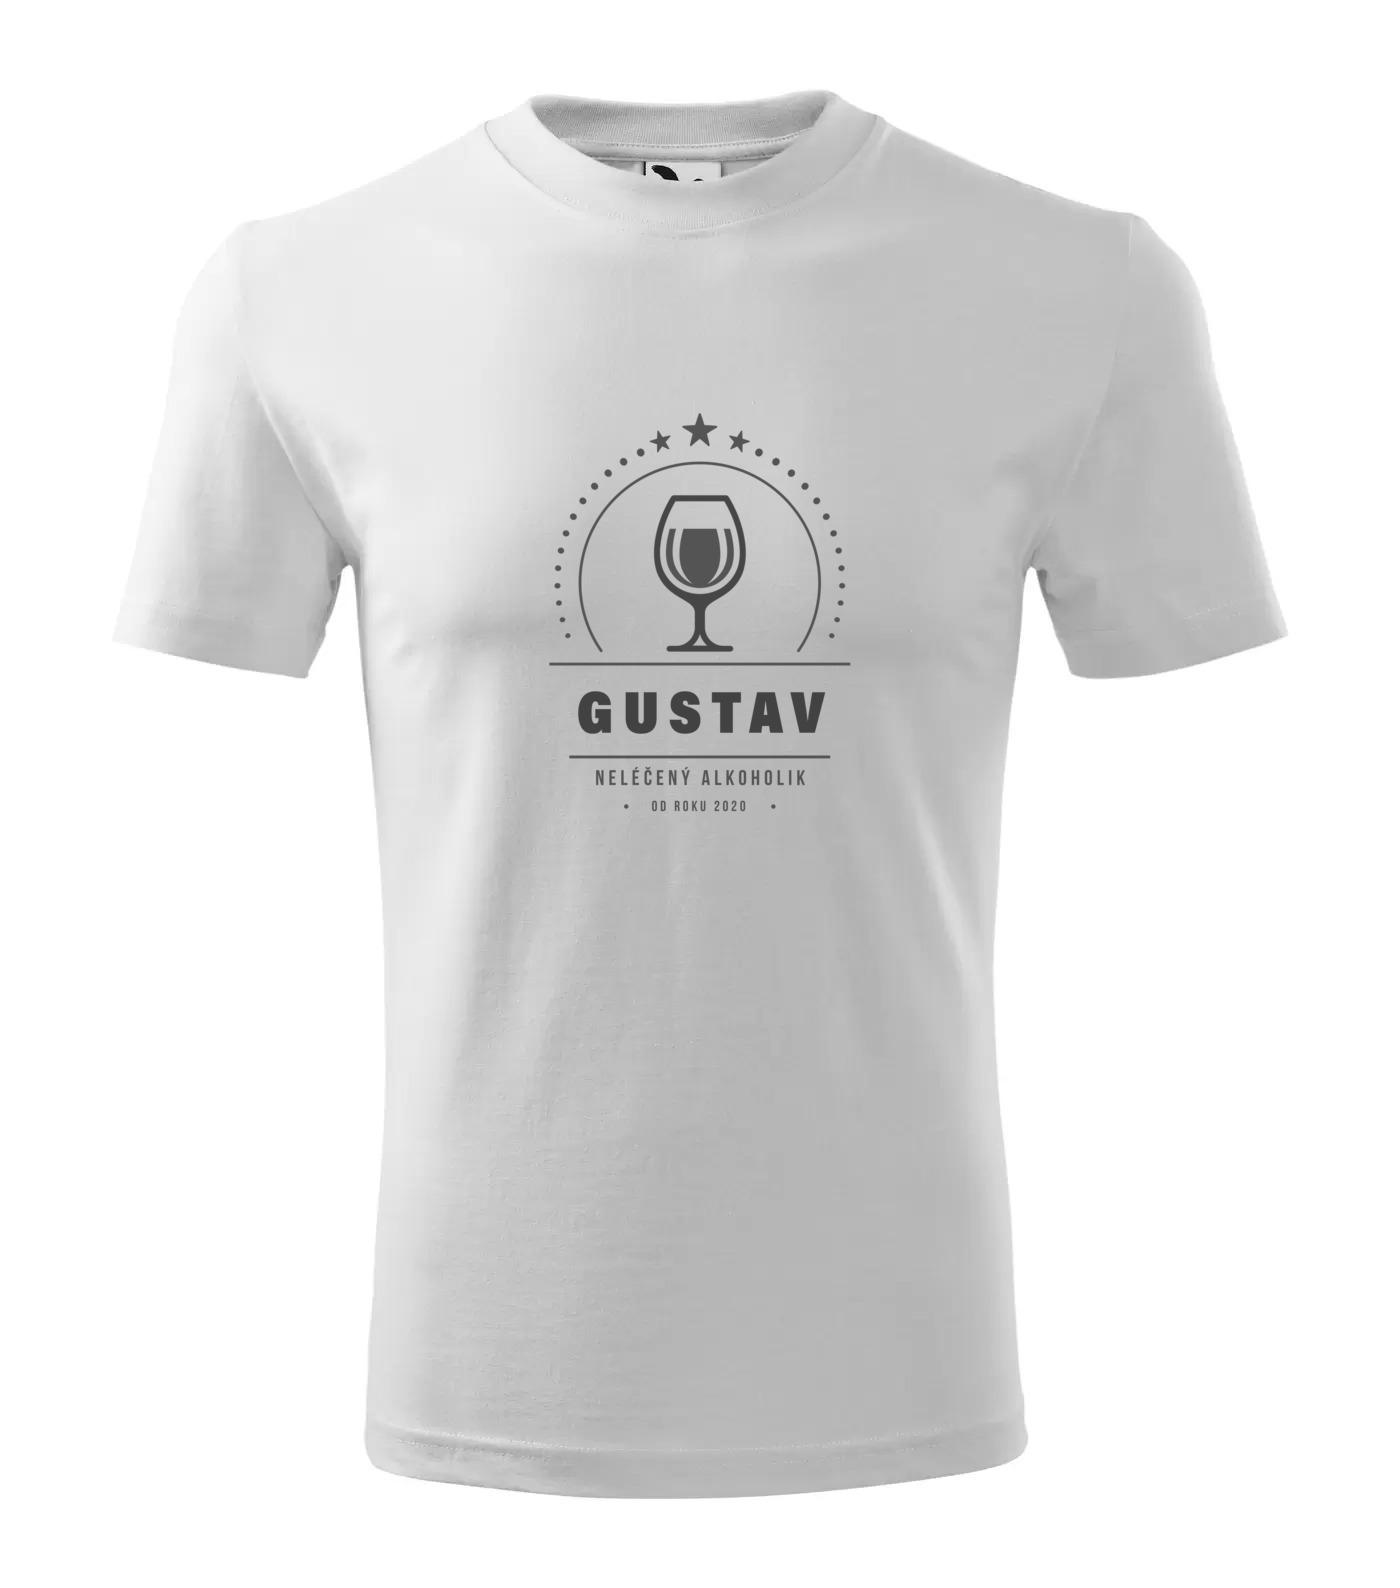 Tričko Alkoholik Gustav